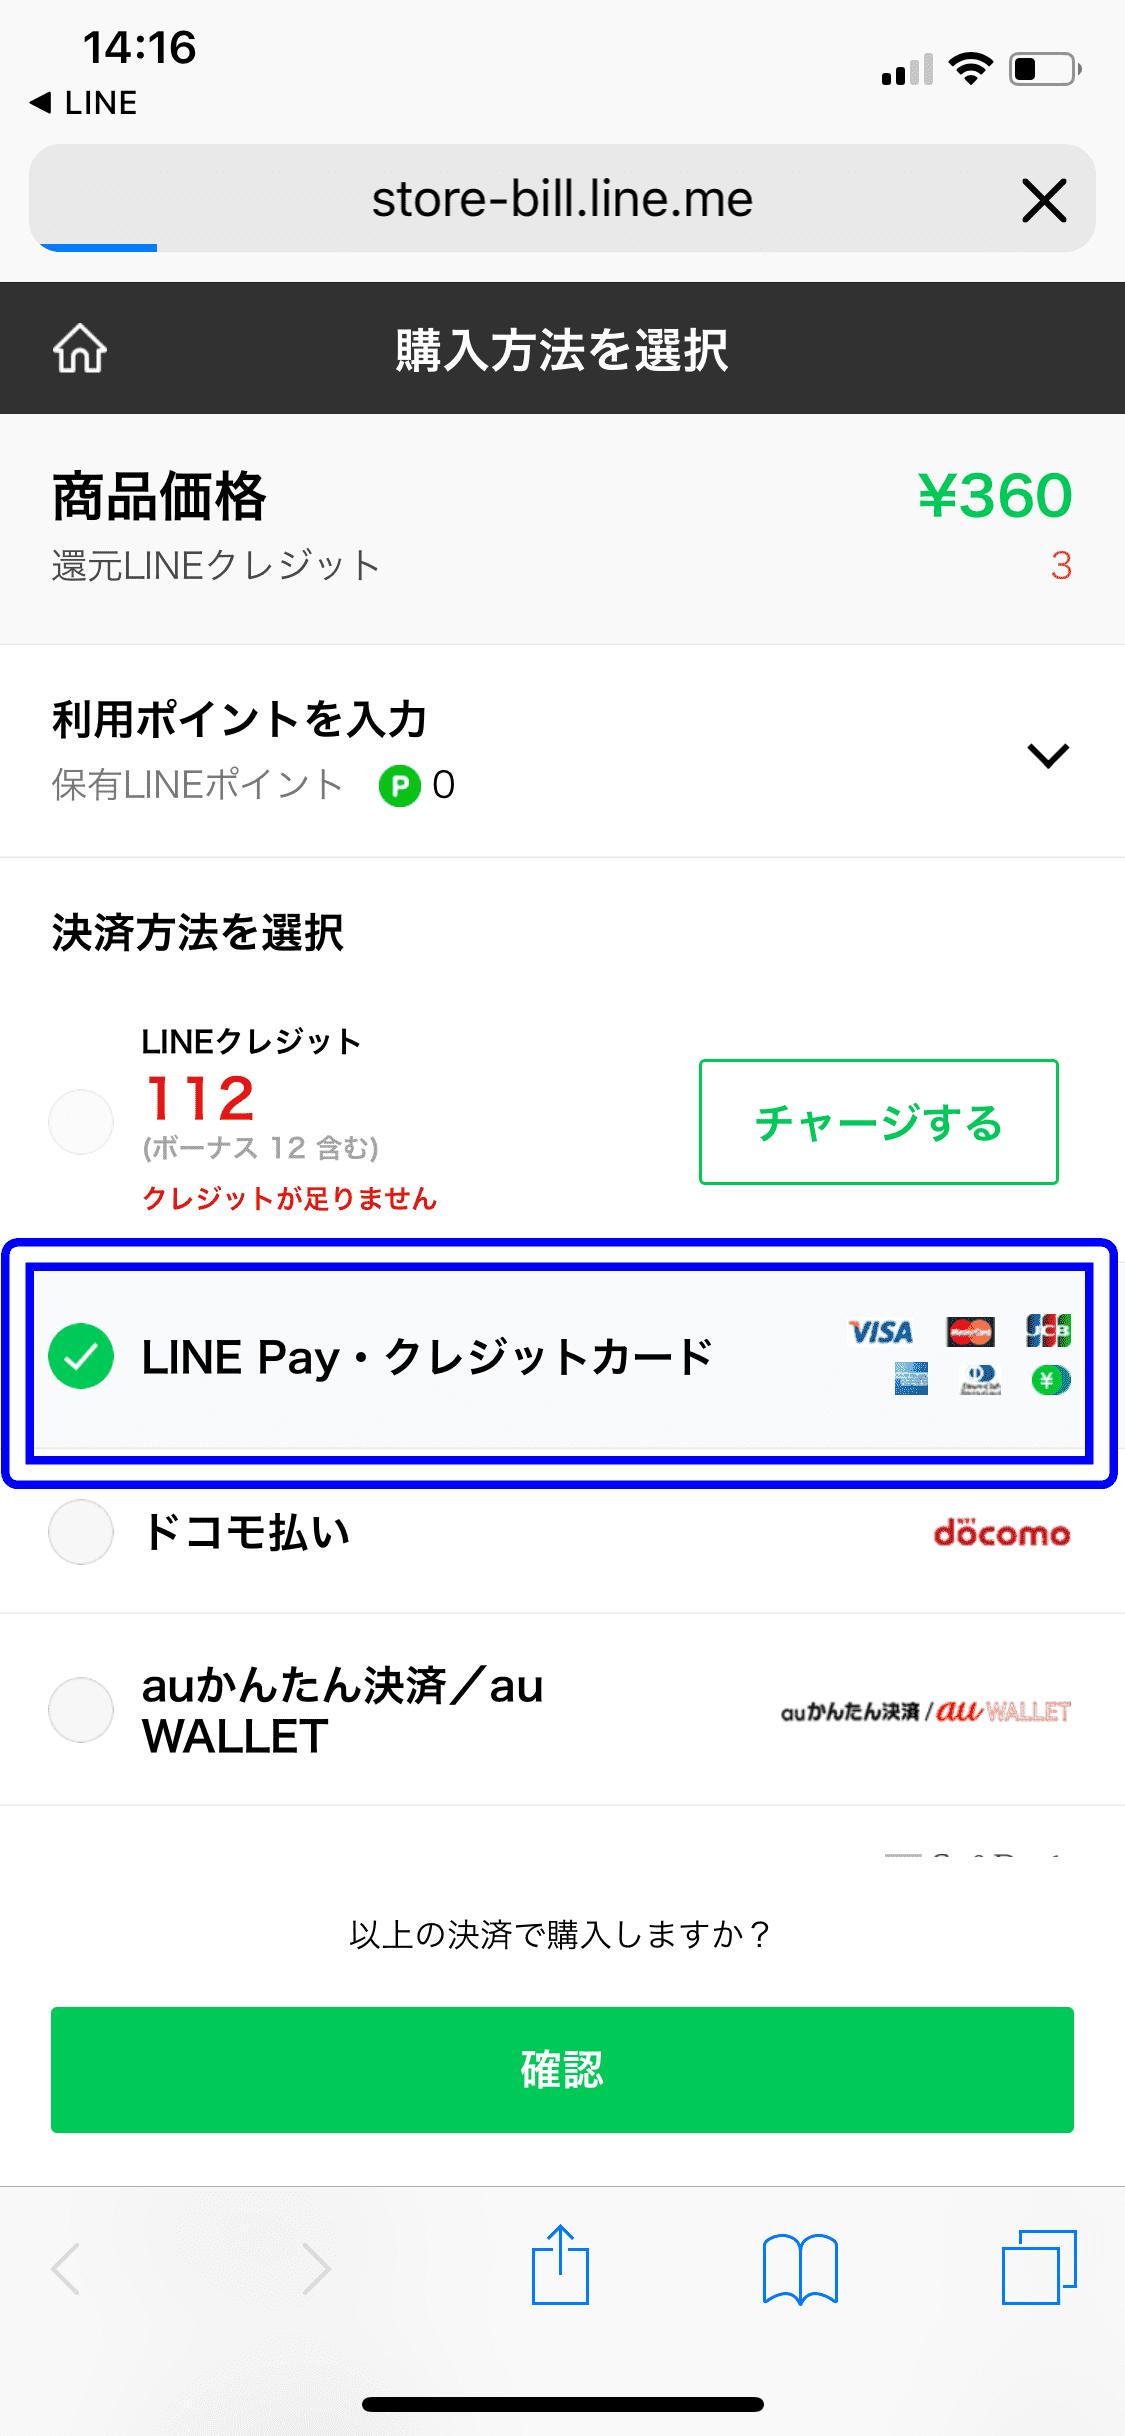 "alt""LINE着せ替えを購入する際に表示される支払い選択画面"""